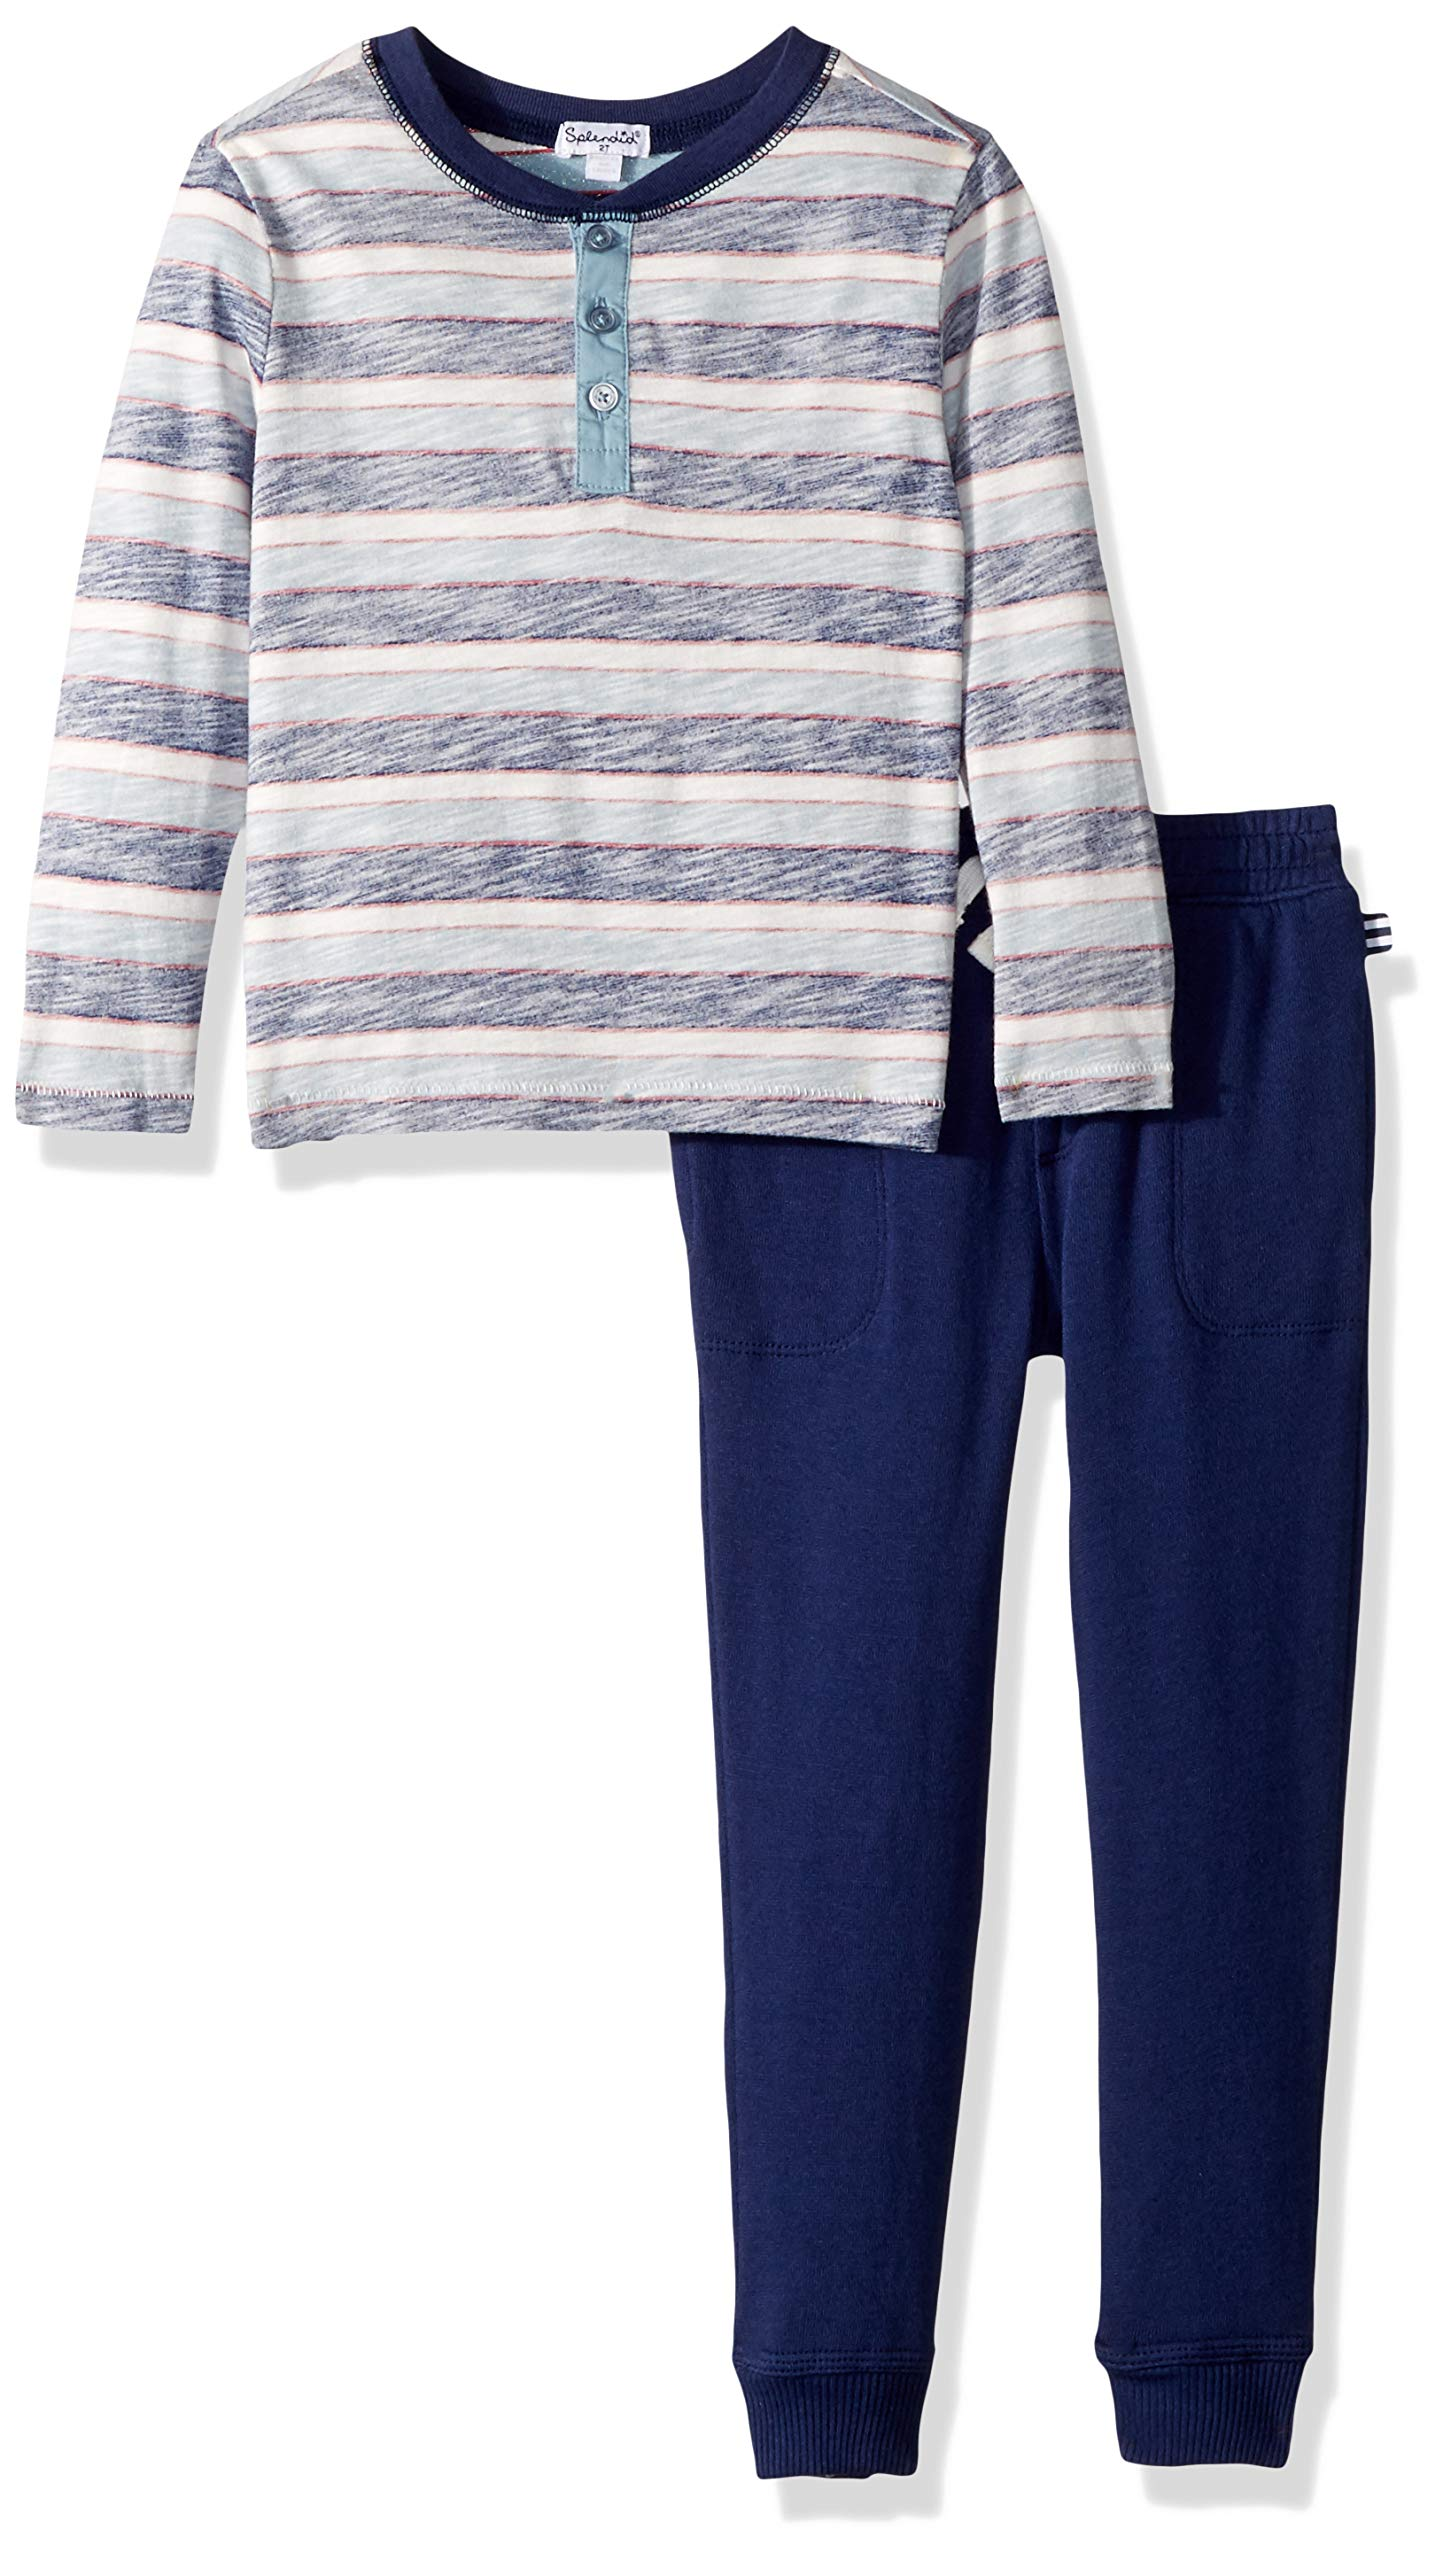 Splendid Toddler Boys' Reverse Stripe Long Sleeve Set, Indigo Sky, 2T